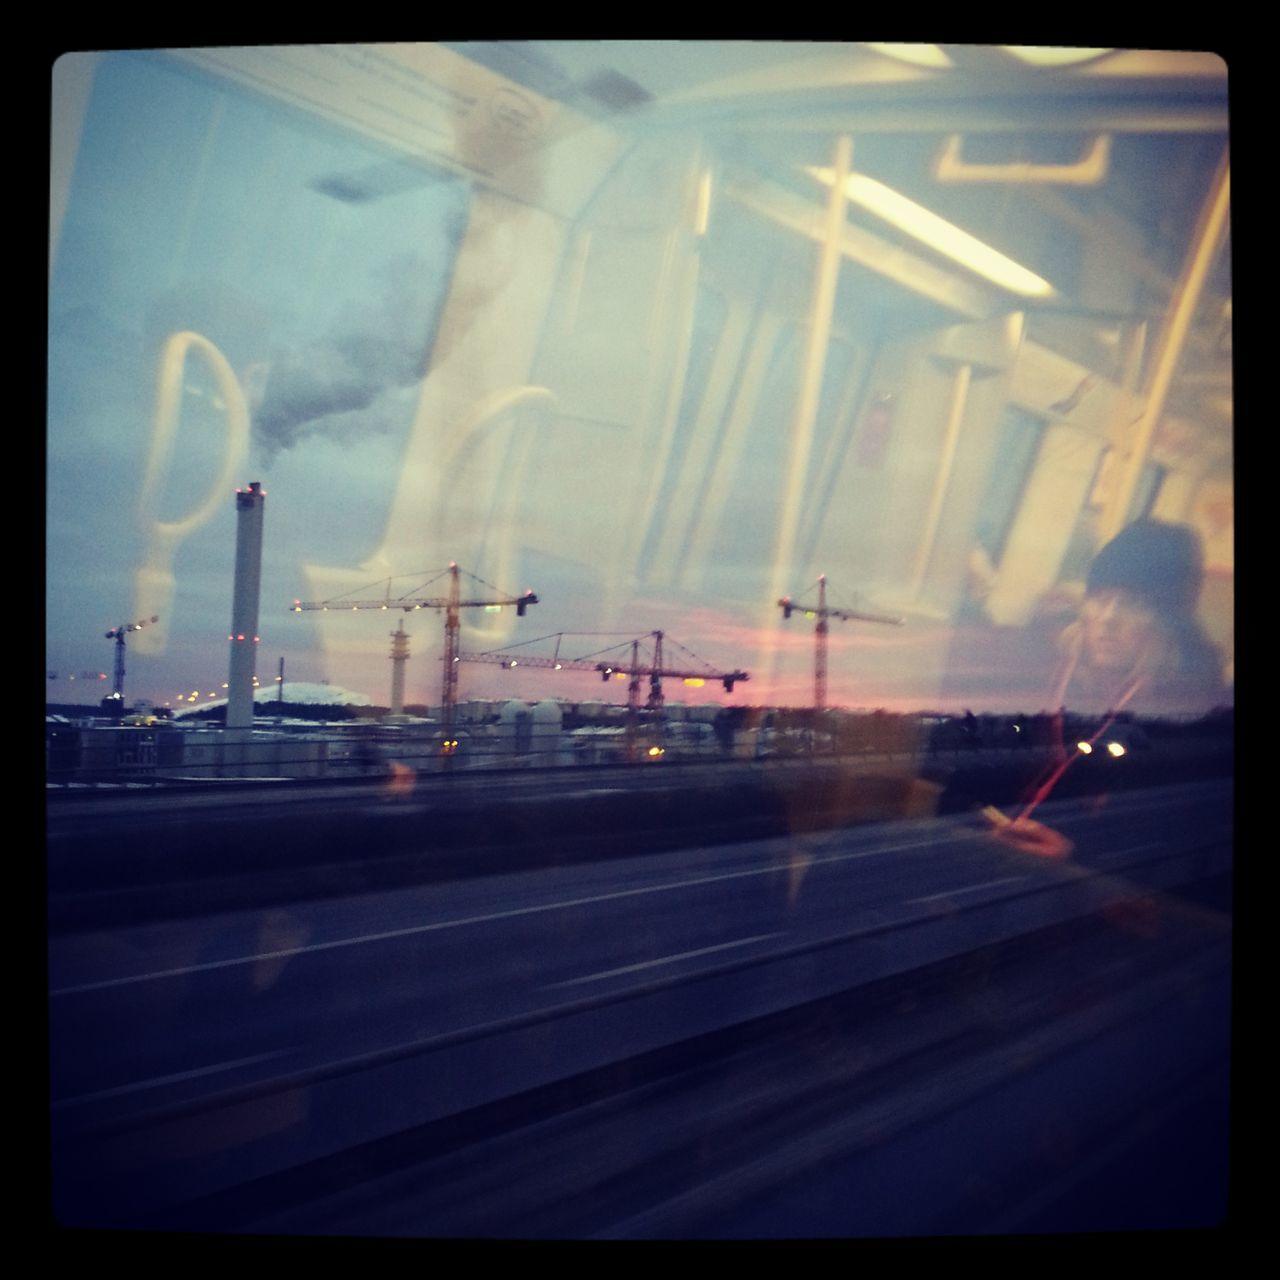 transportation, illuminated, no people, sky, road, night, outdoors, runway